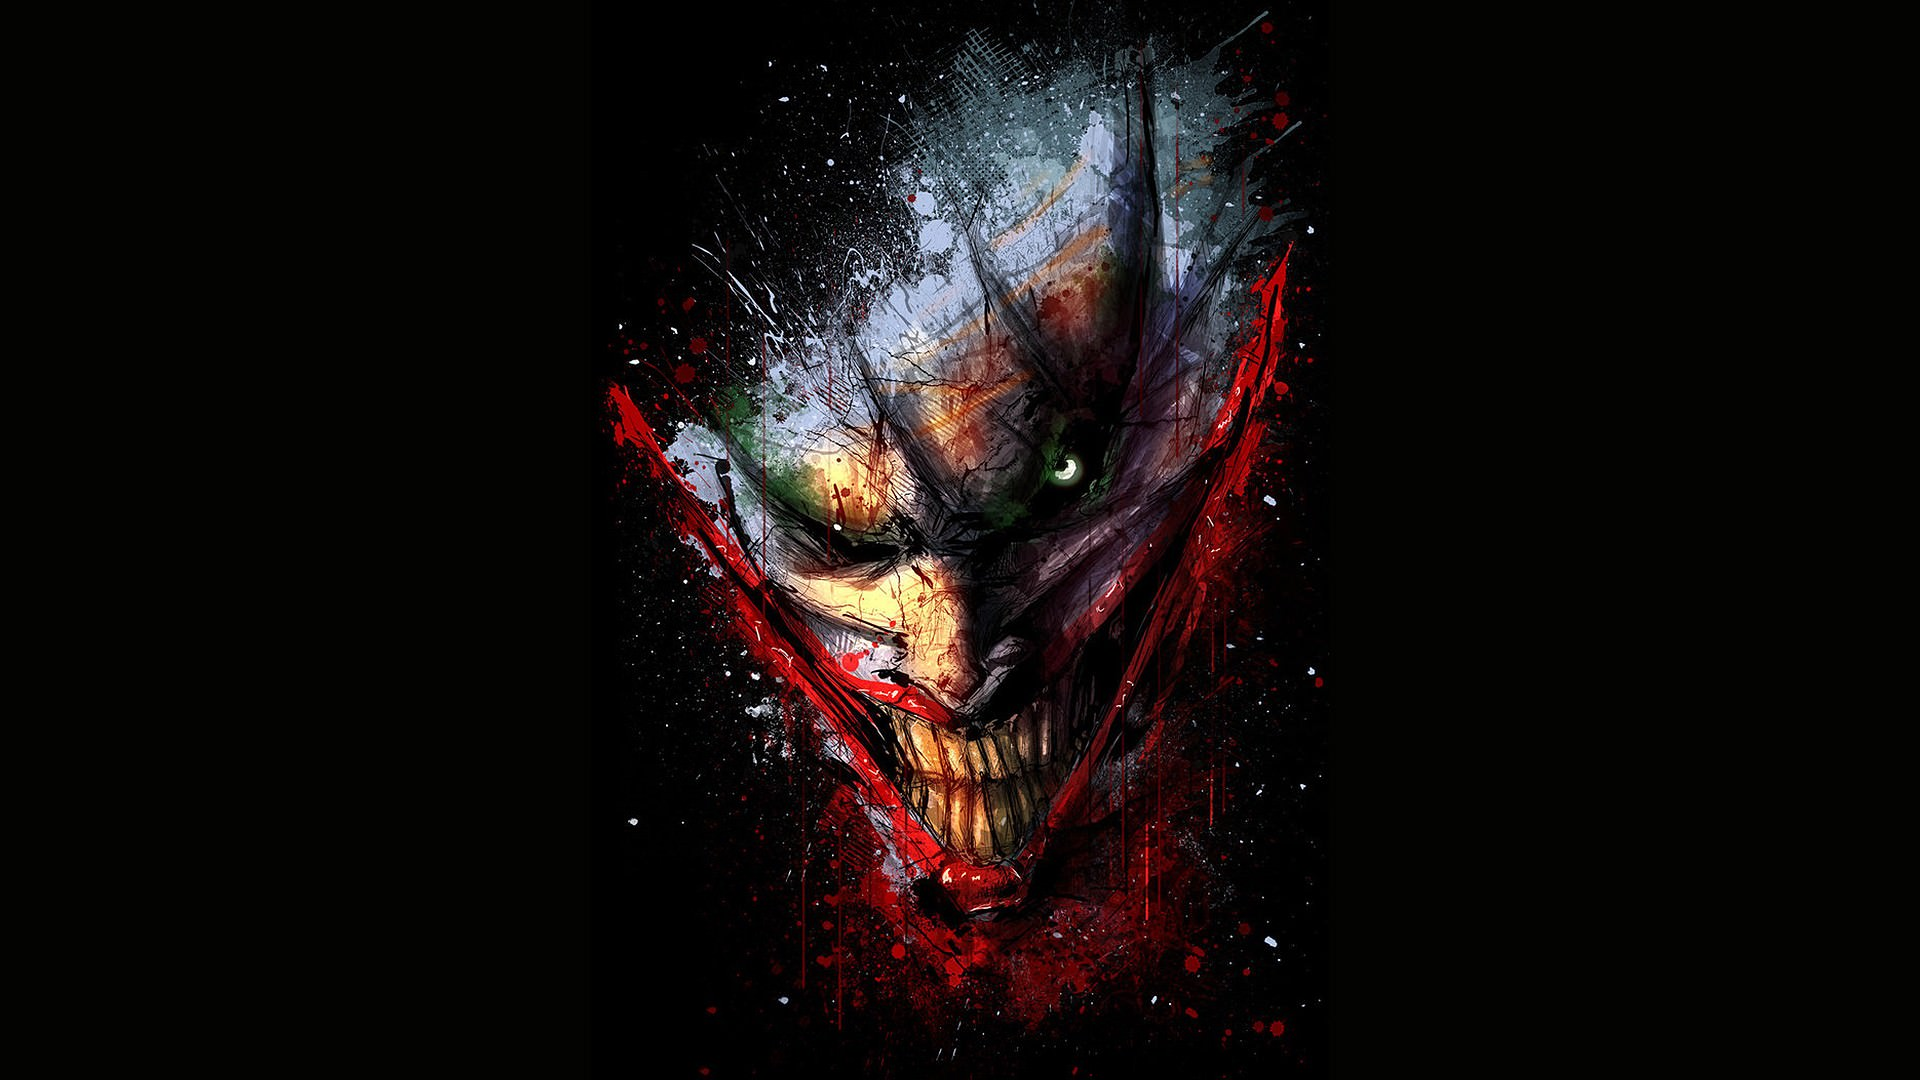 DC Comics   The Joker Wallpaper   DigitalArtio 1920x1080